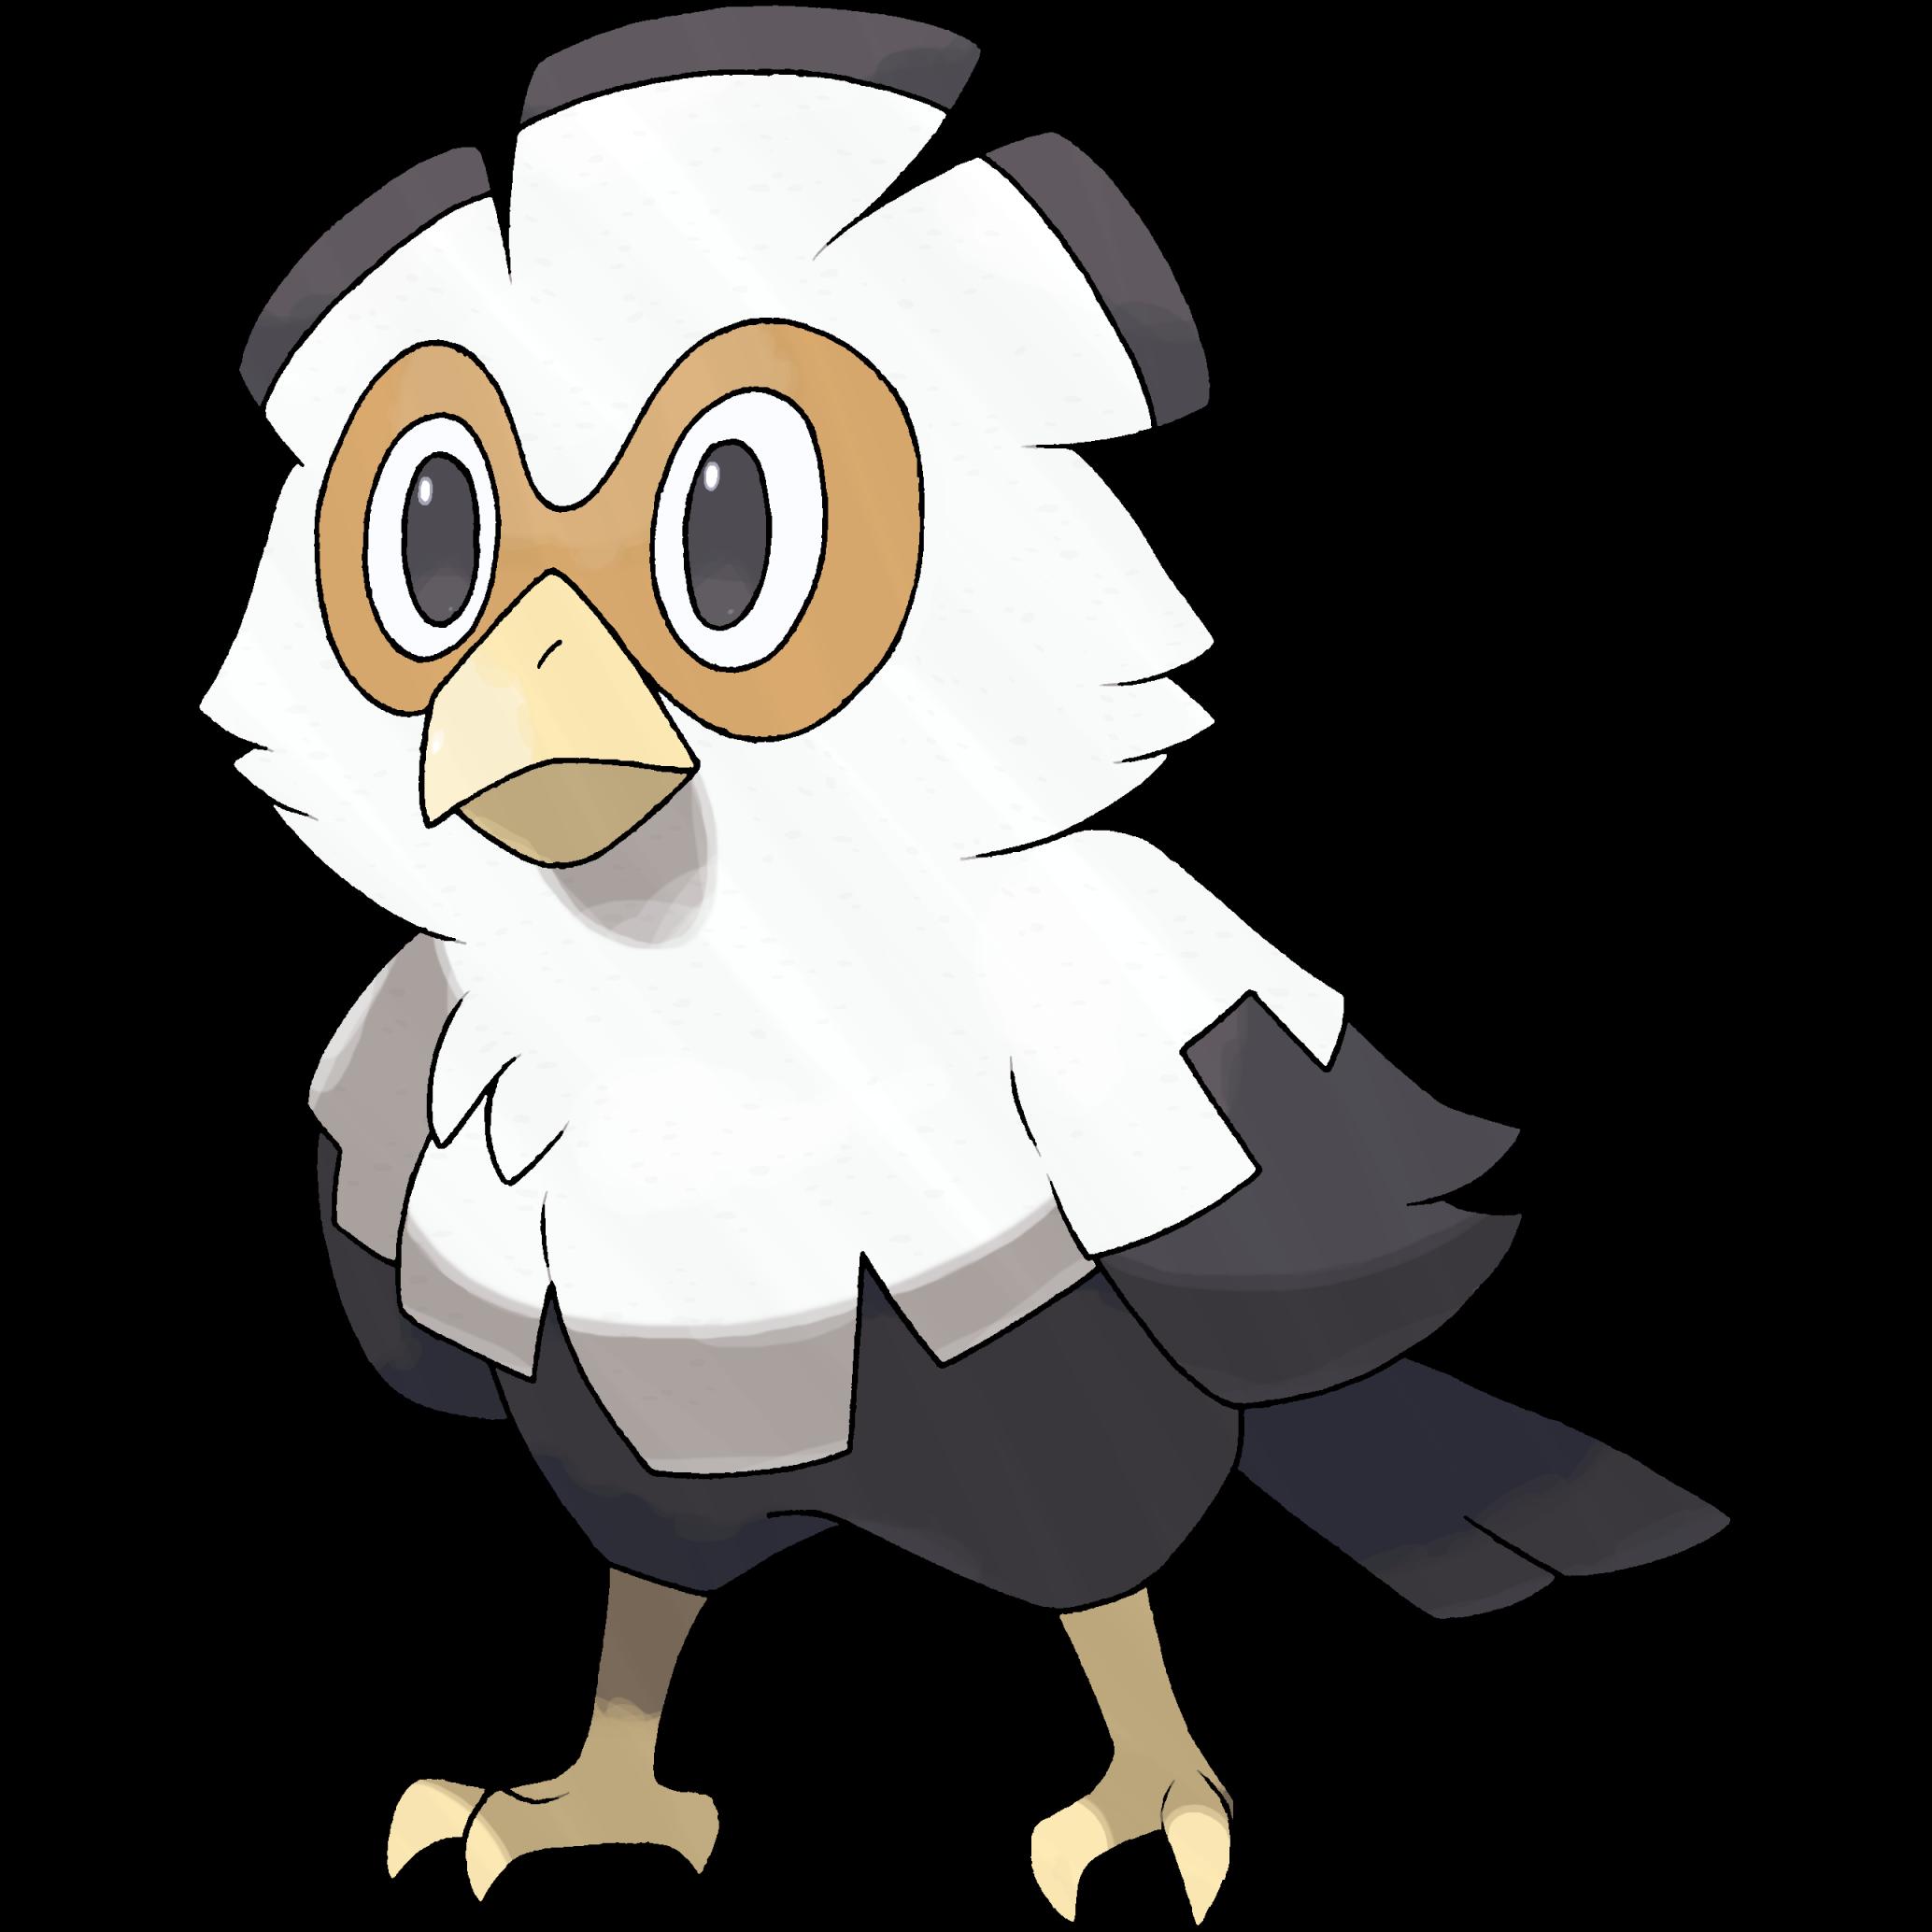 Nest clipart fledgling. Harpee capx wiki fandom